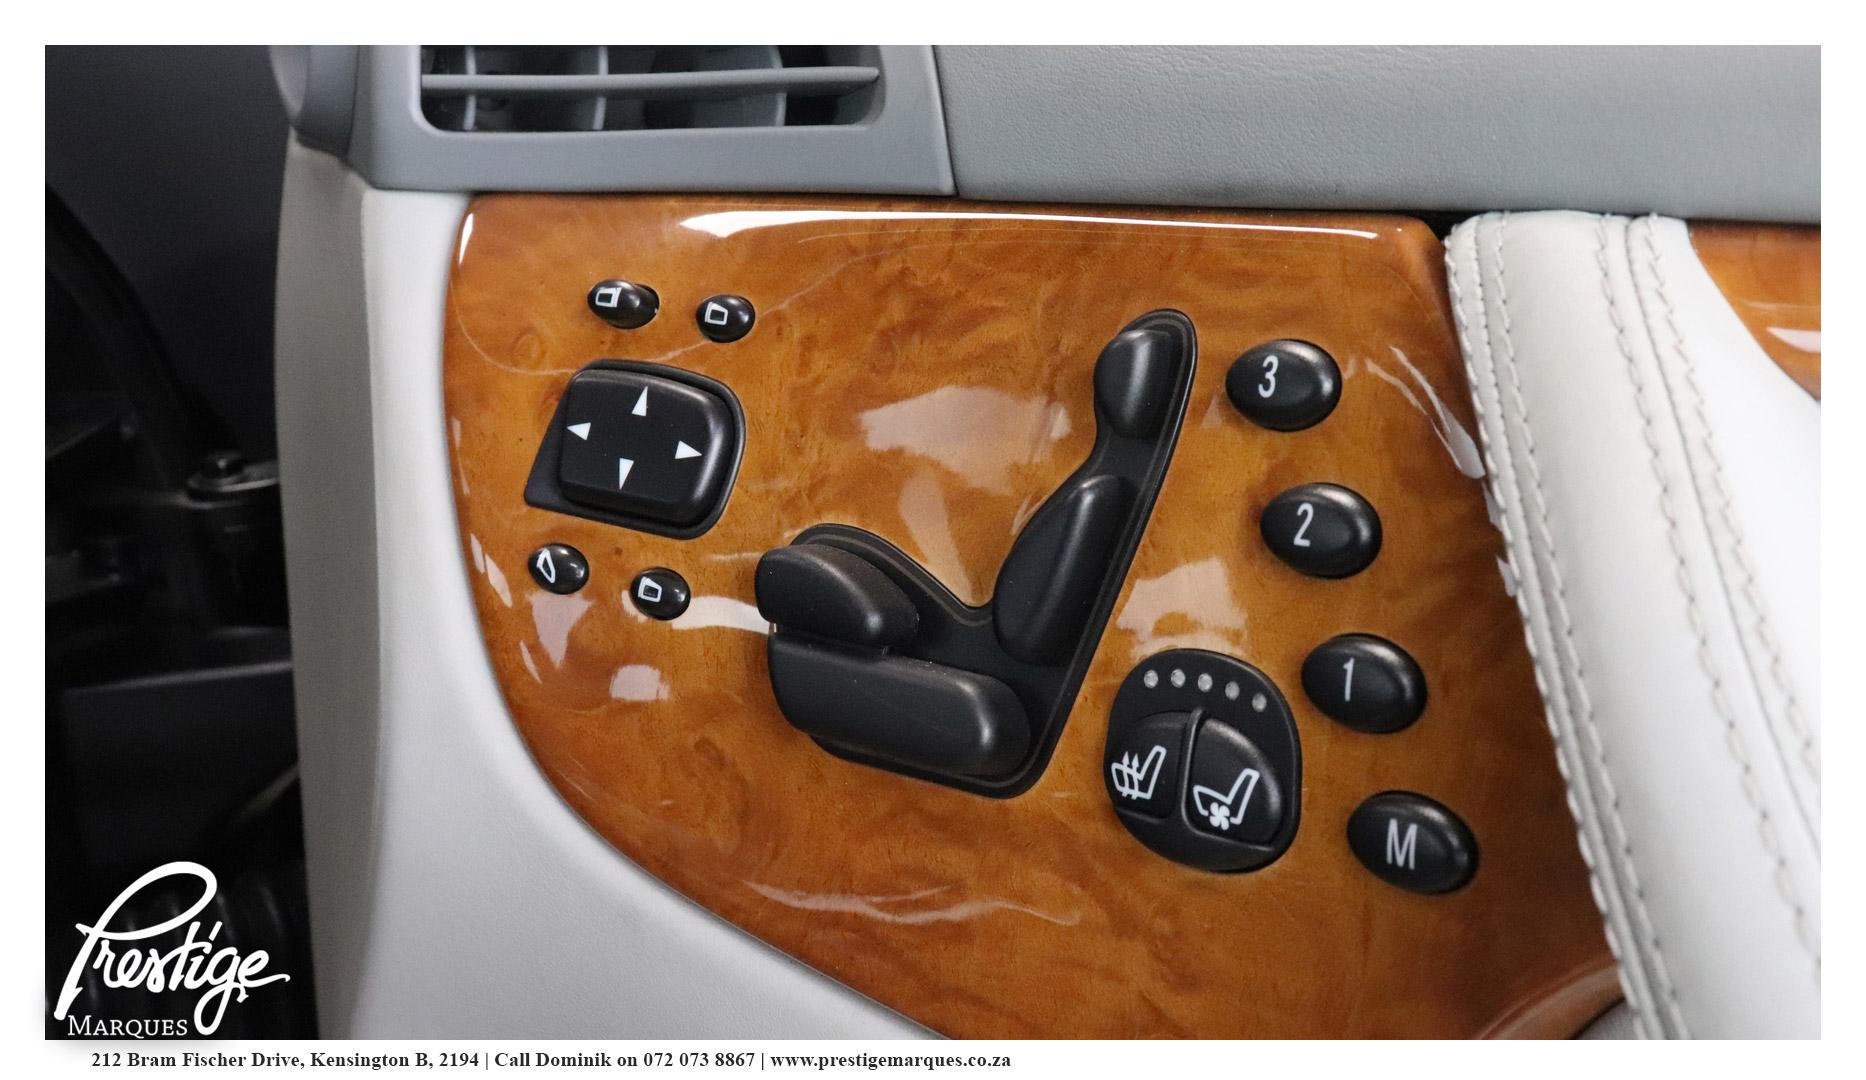 2005-Mercedes-Benz-CL-600-Coupe-Prestige-Marques-Randburg-Sandton-13